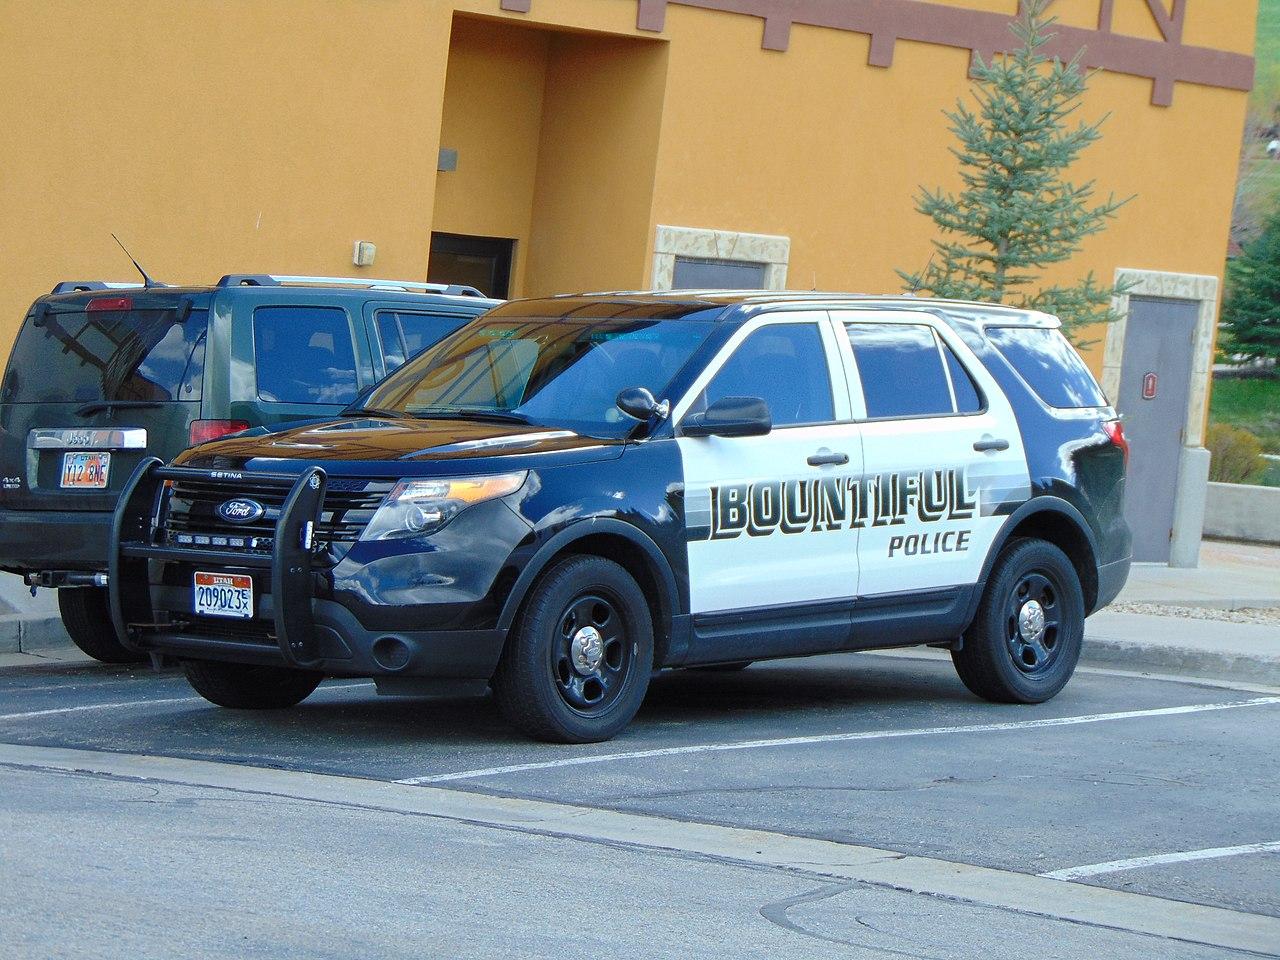 Cars On Line >> File:Police car Bountiful, Utah, Apr 16.jpg - Wikimedia ...